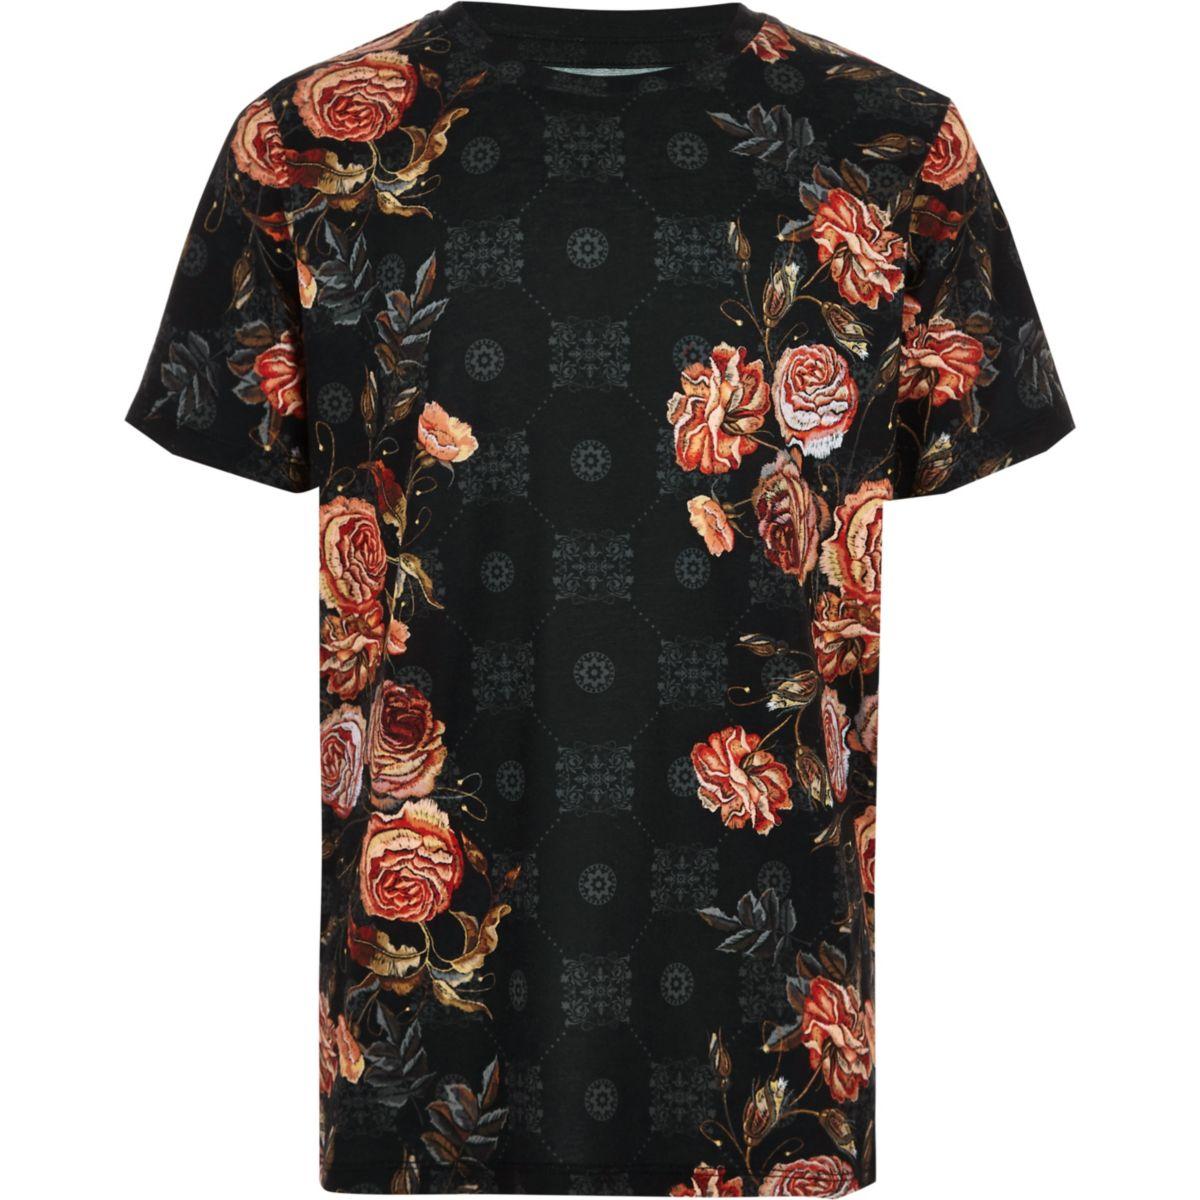 Boys black floral tile print T-shirt